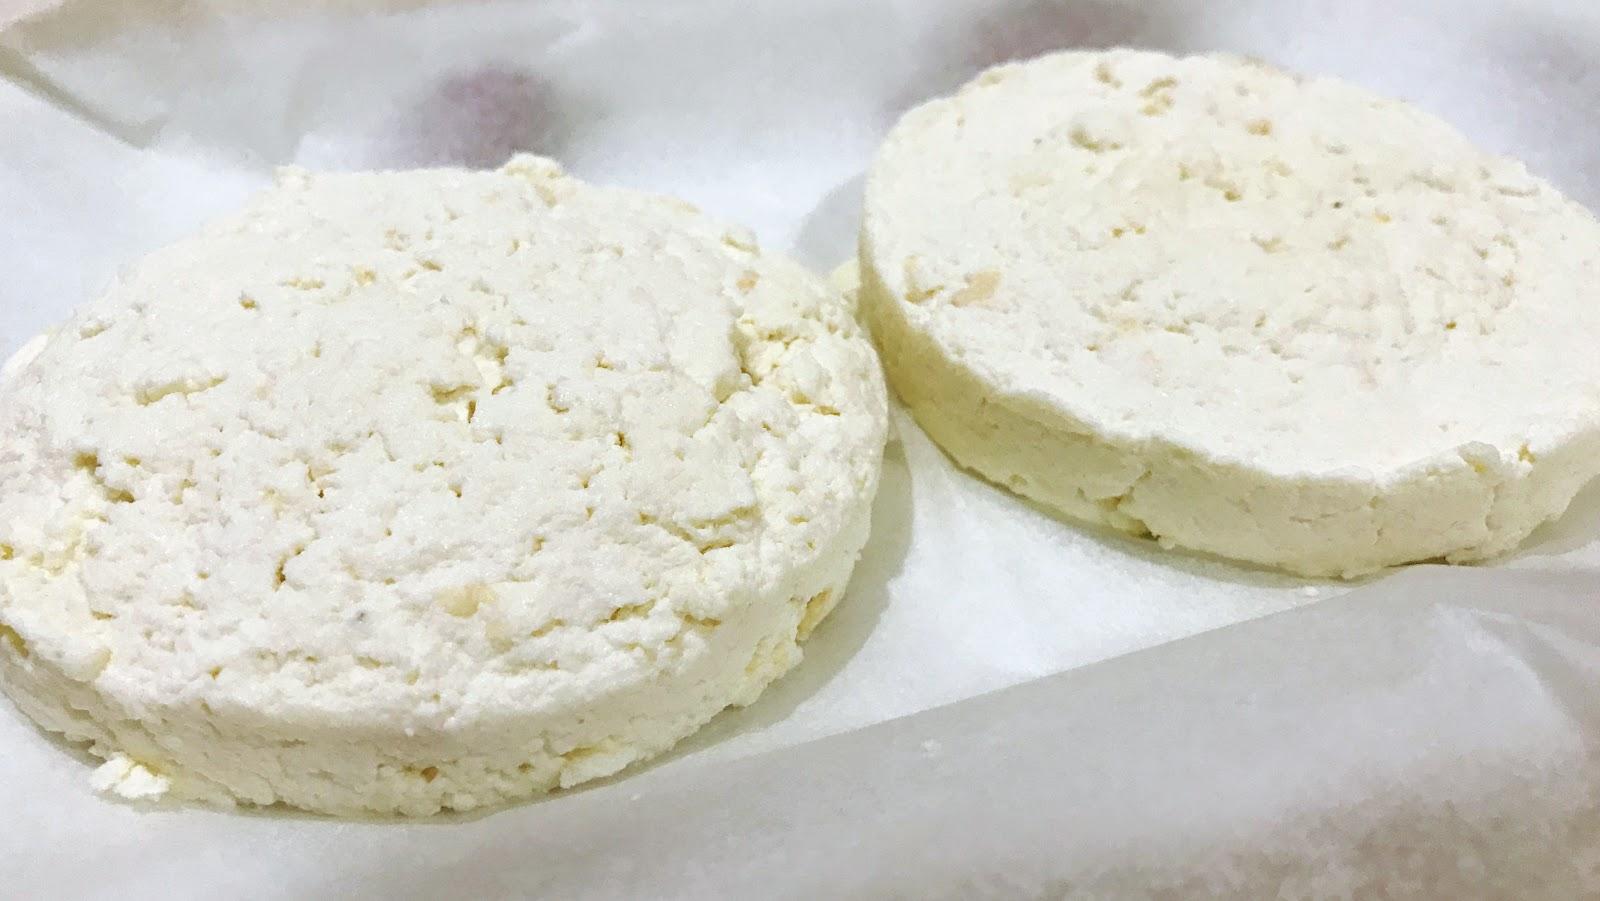 IMG_3700.HEIC-cheese